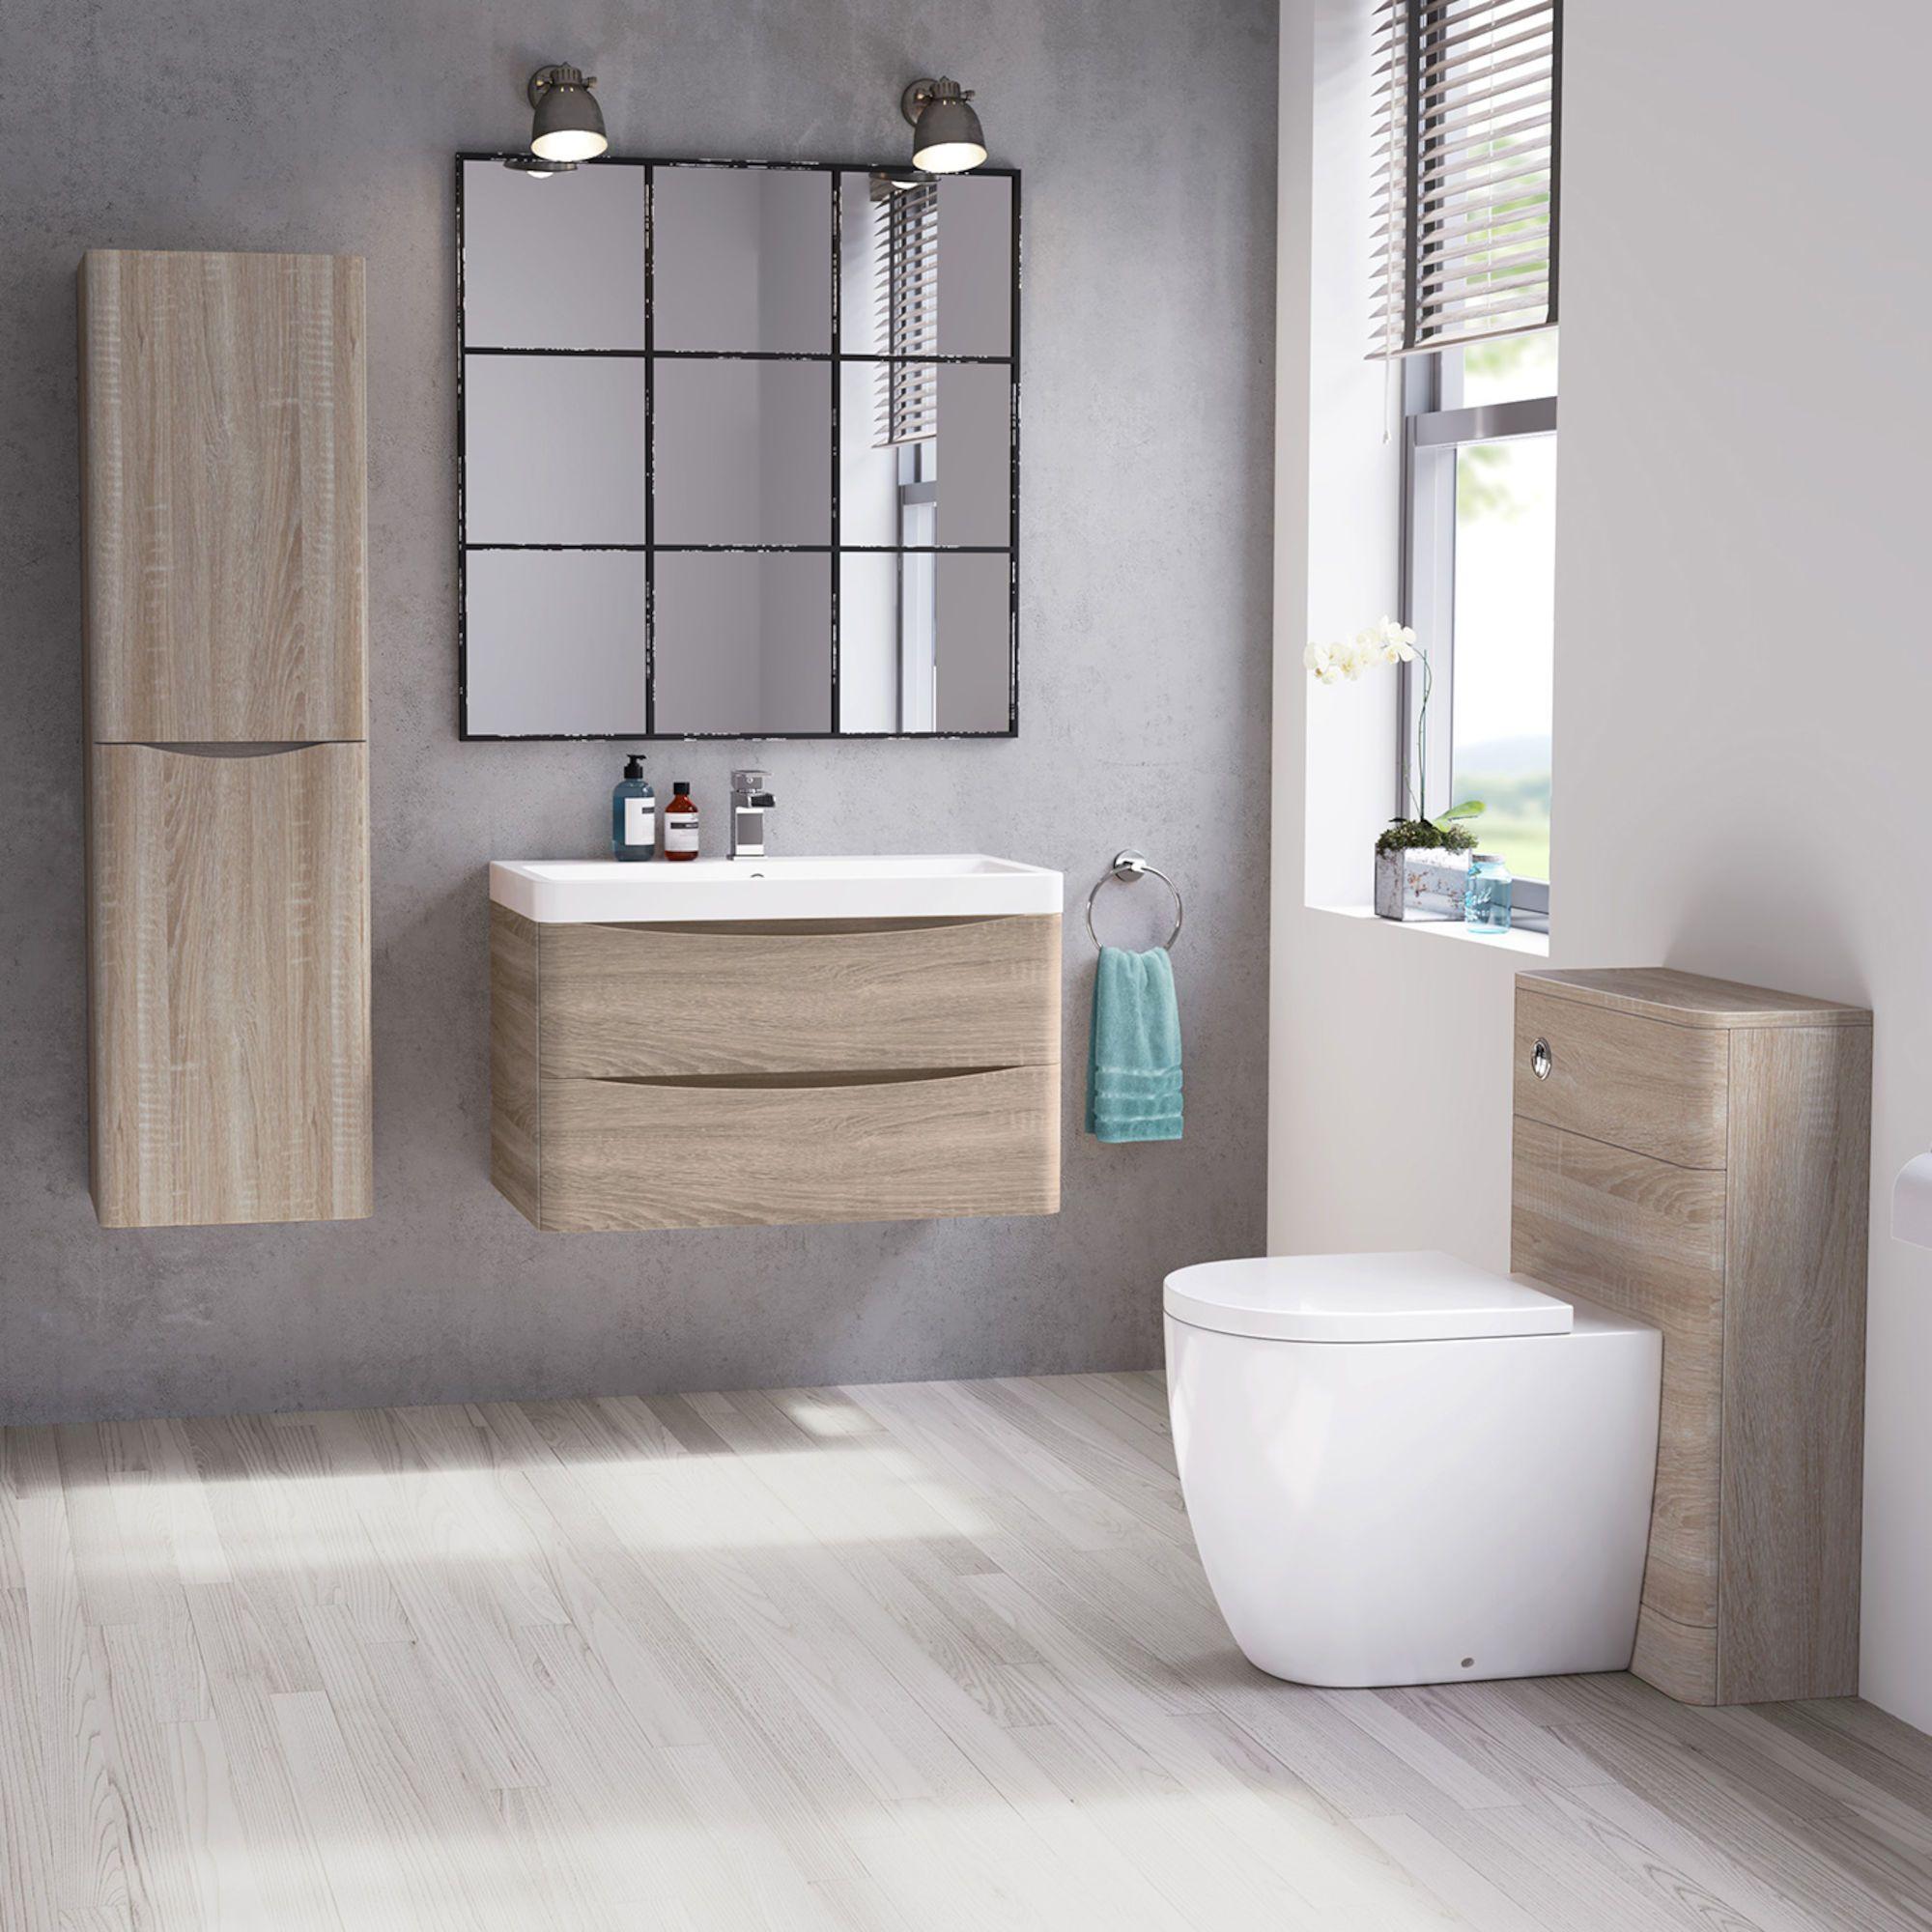 800mm Austin Ii Light Oak Effect Built In Basin Drawer Unit Wall Hung Bathroom Wall Units Bathroom Furniture Storage Vanity Units